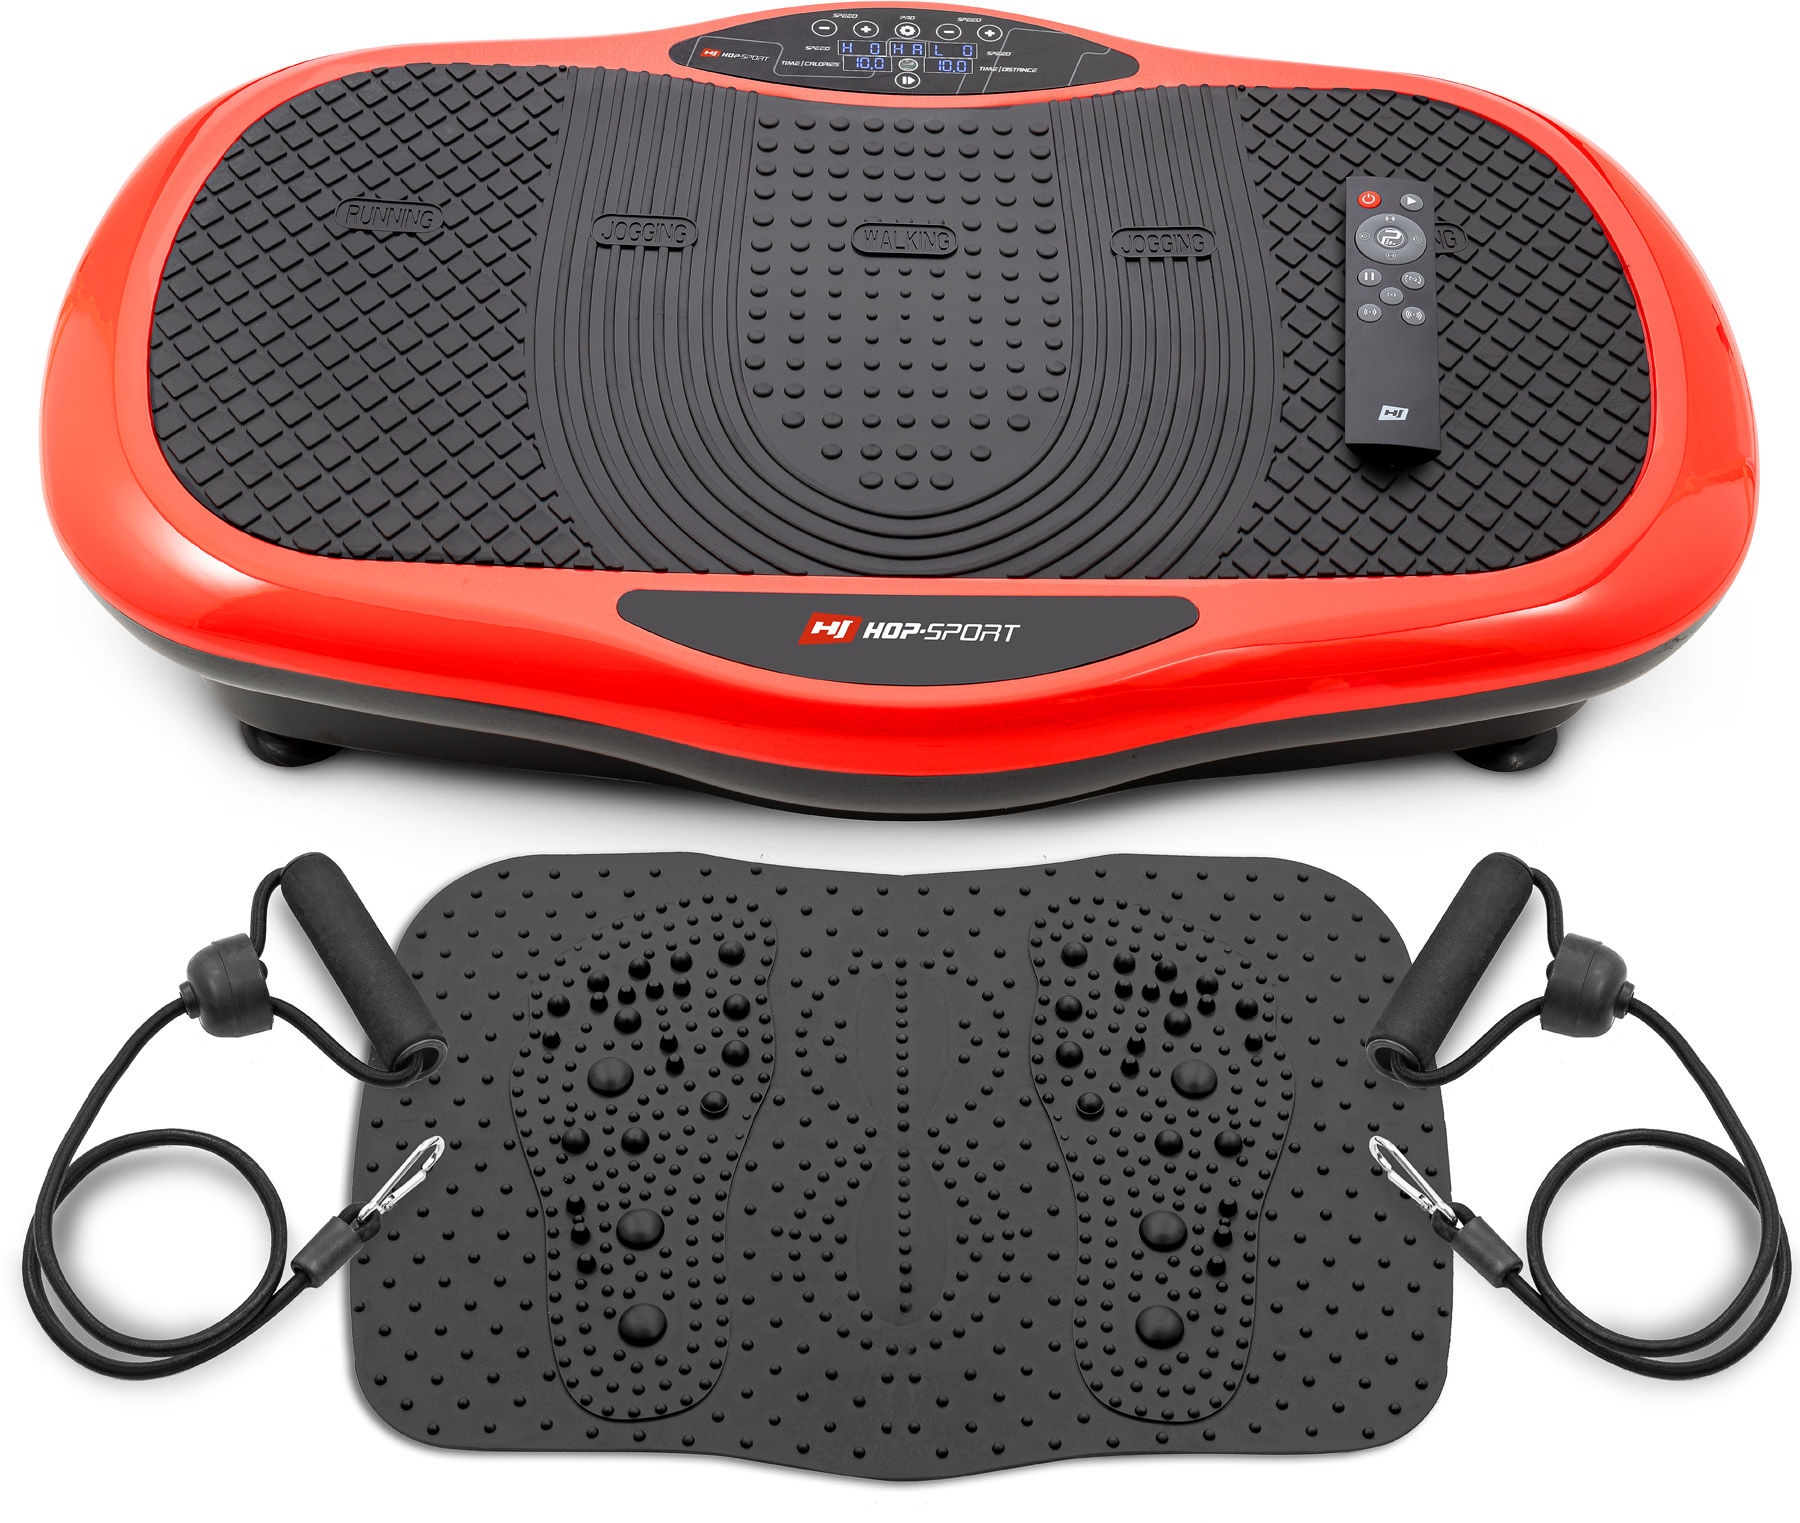 Platforma wibracyjna 3D HS-070VS Scout-Czerwona+mata